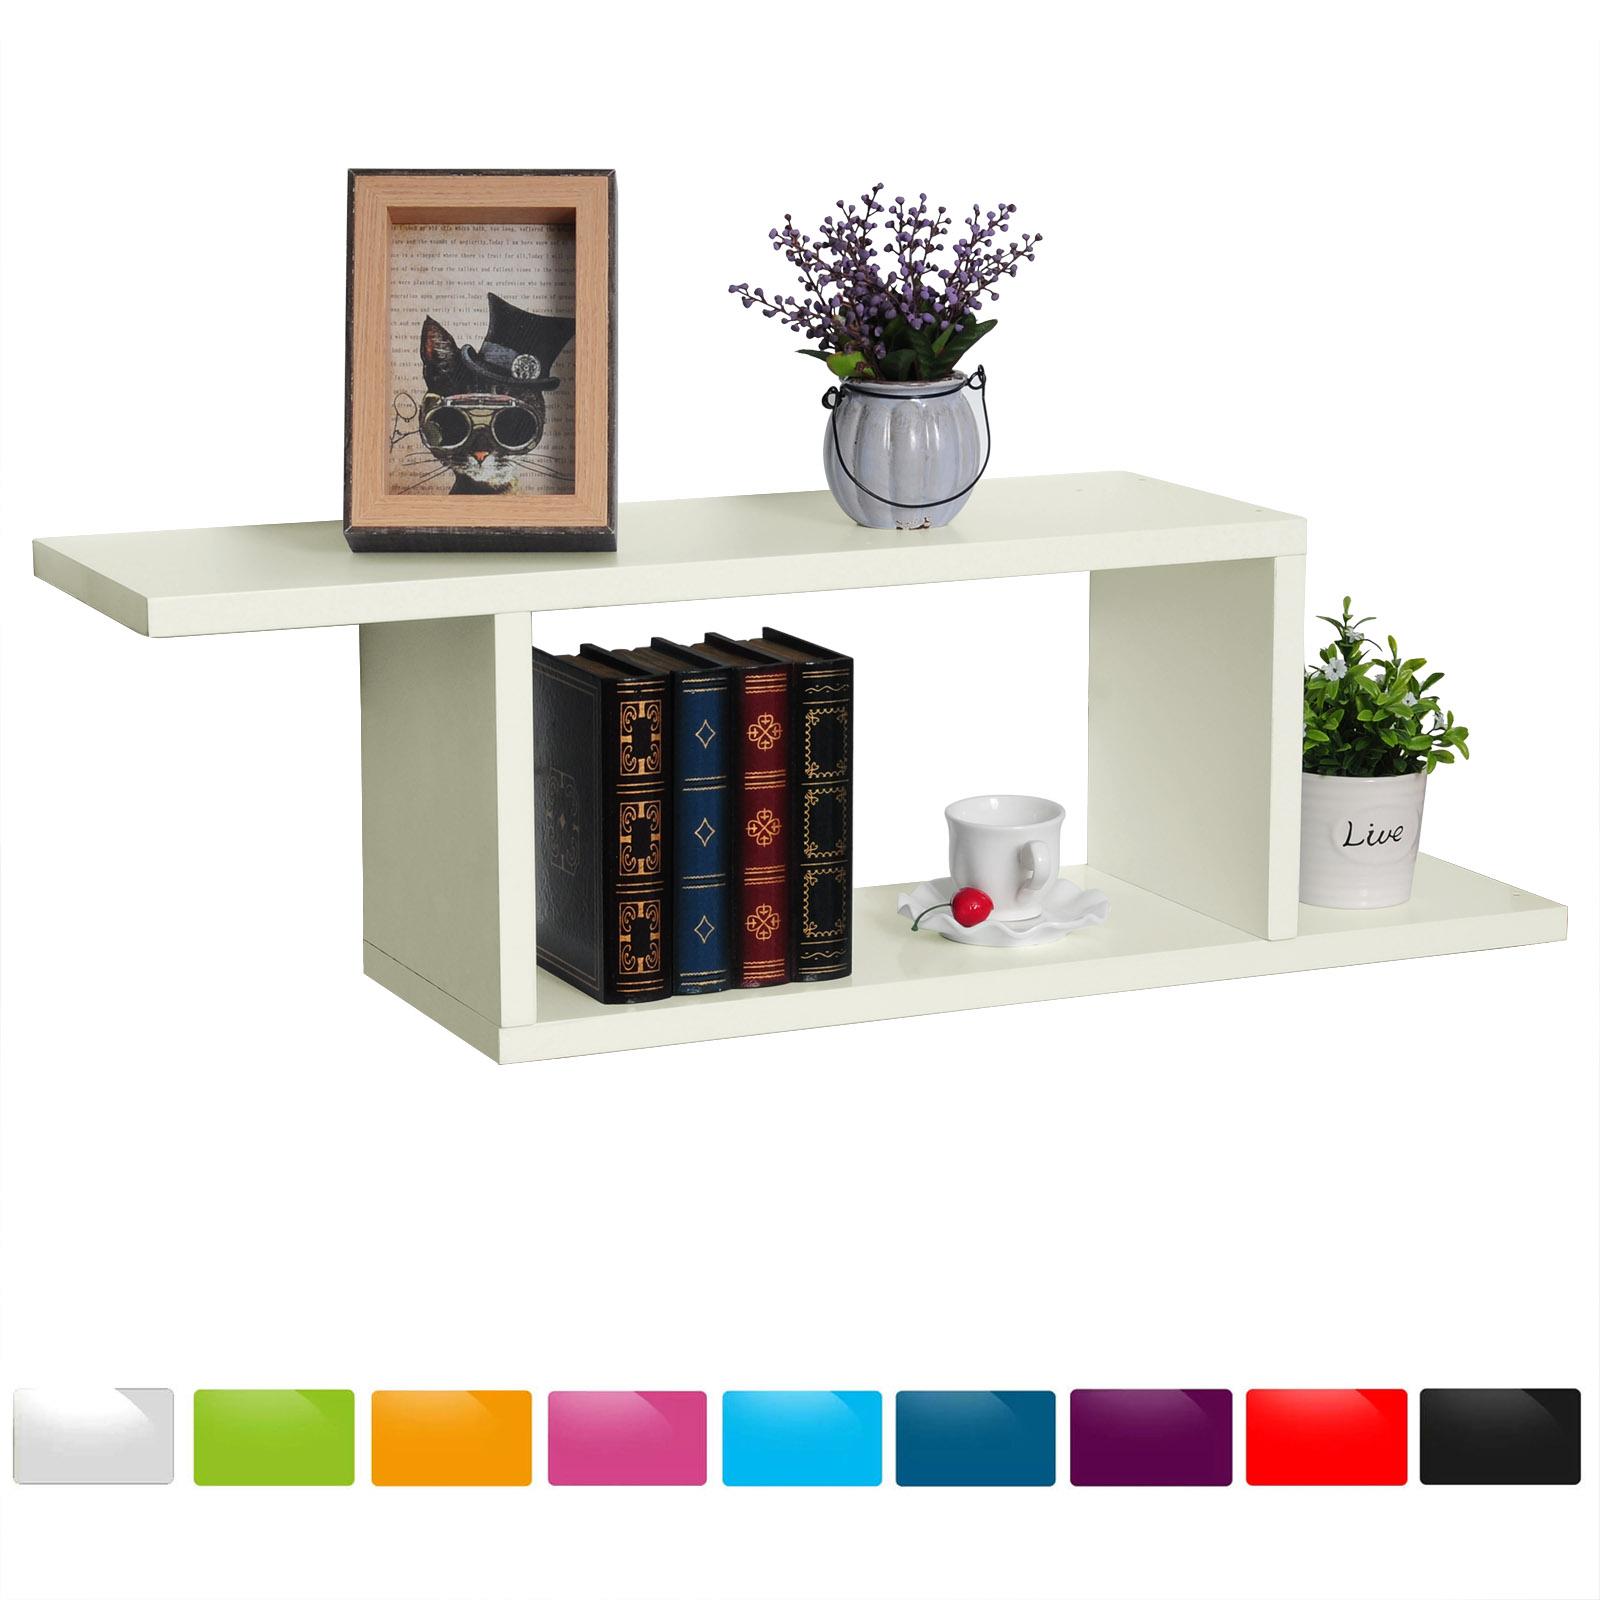 wandregal h ngeregal b cheregal cube cd regal 3er set holzregal schweberegal 65 ebay. Black Bedroom Furniture Sets. Home Design Ideas